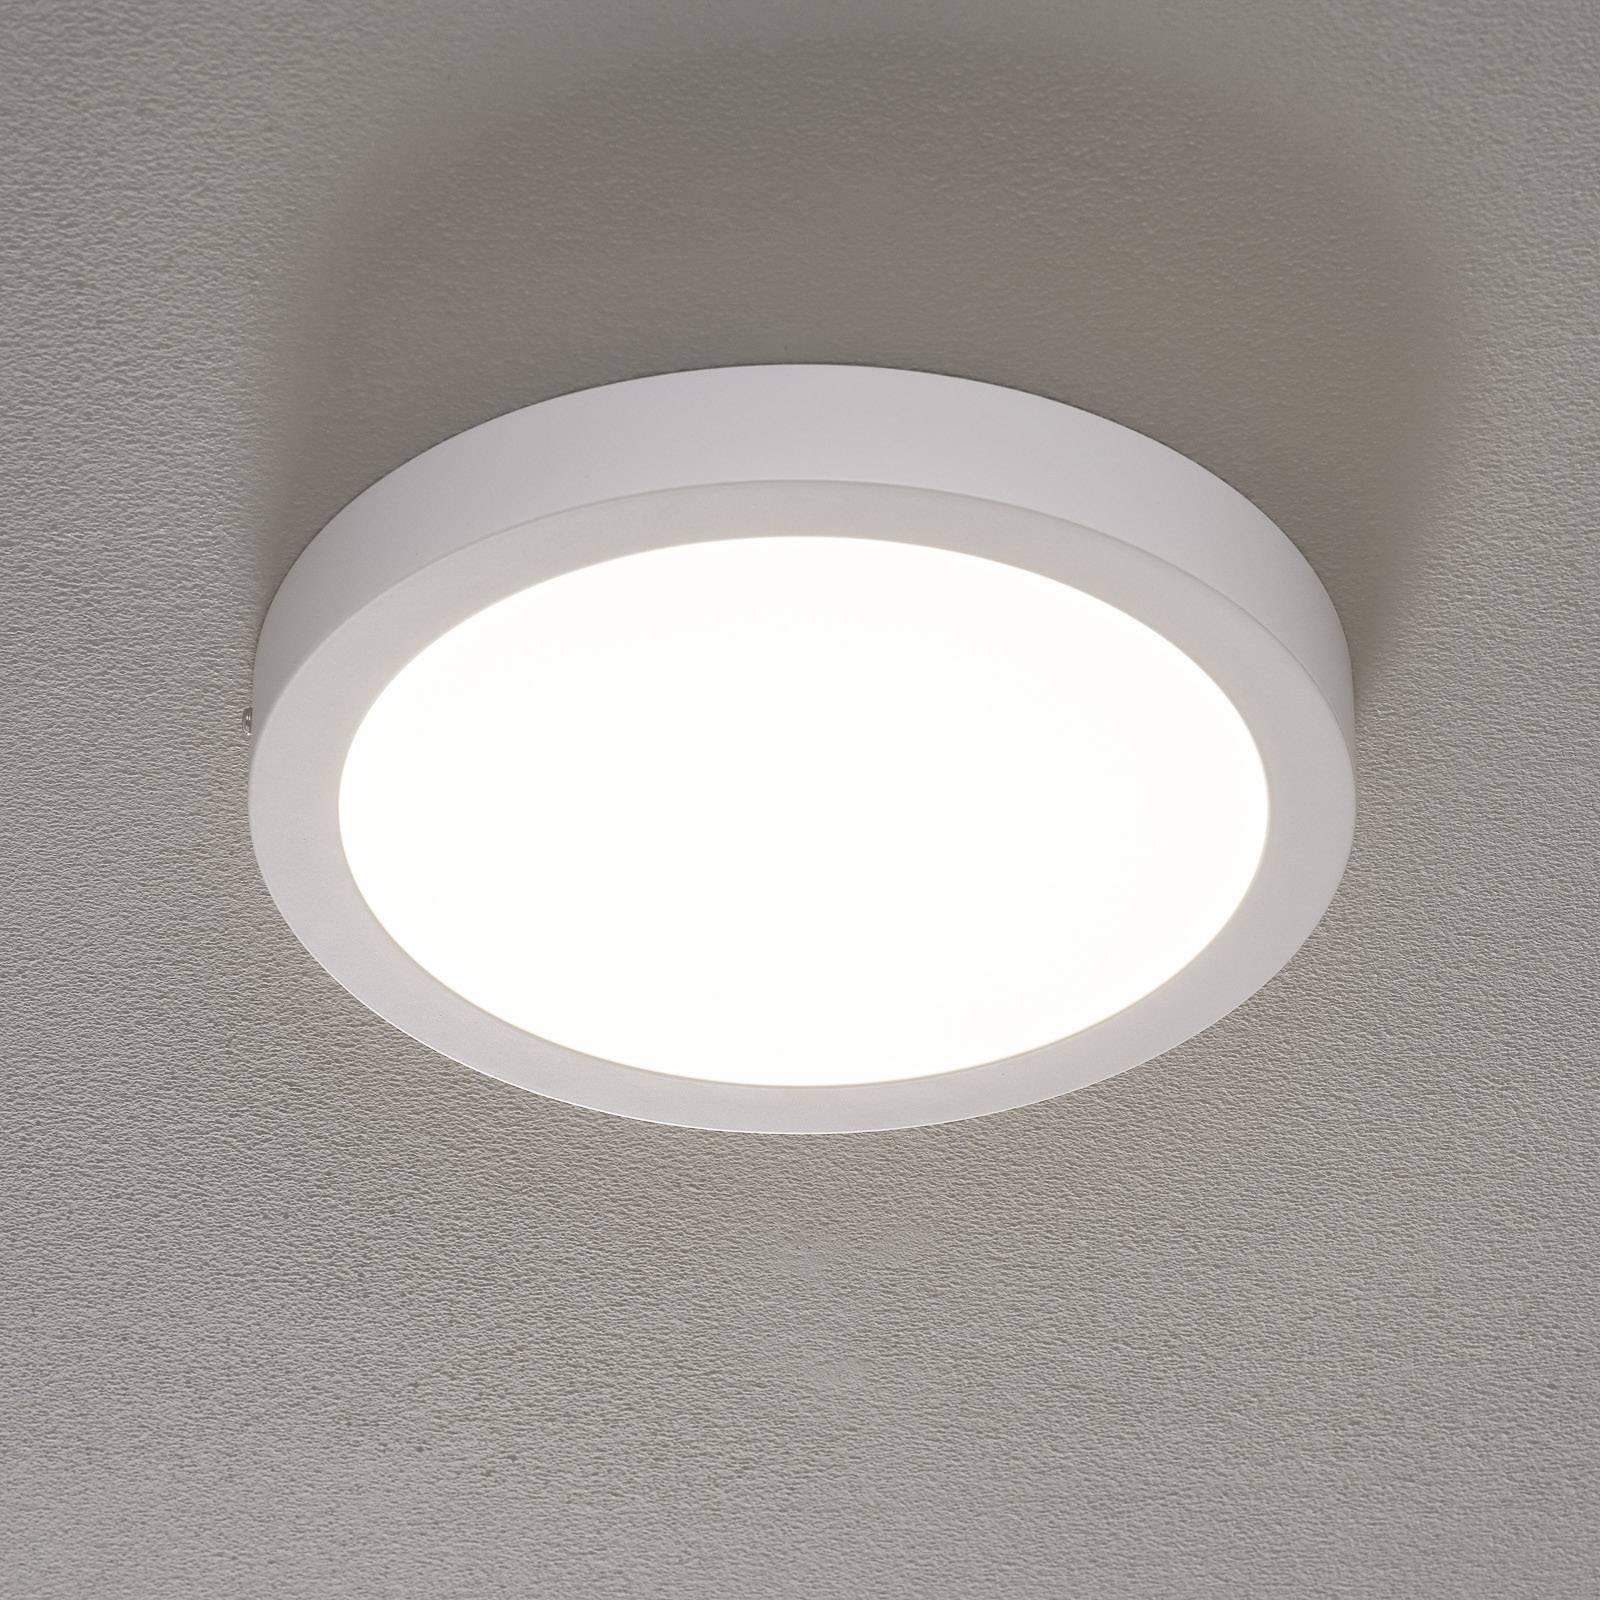 EGLO connect Fueva-C plafondlamp rond 30cm wit